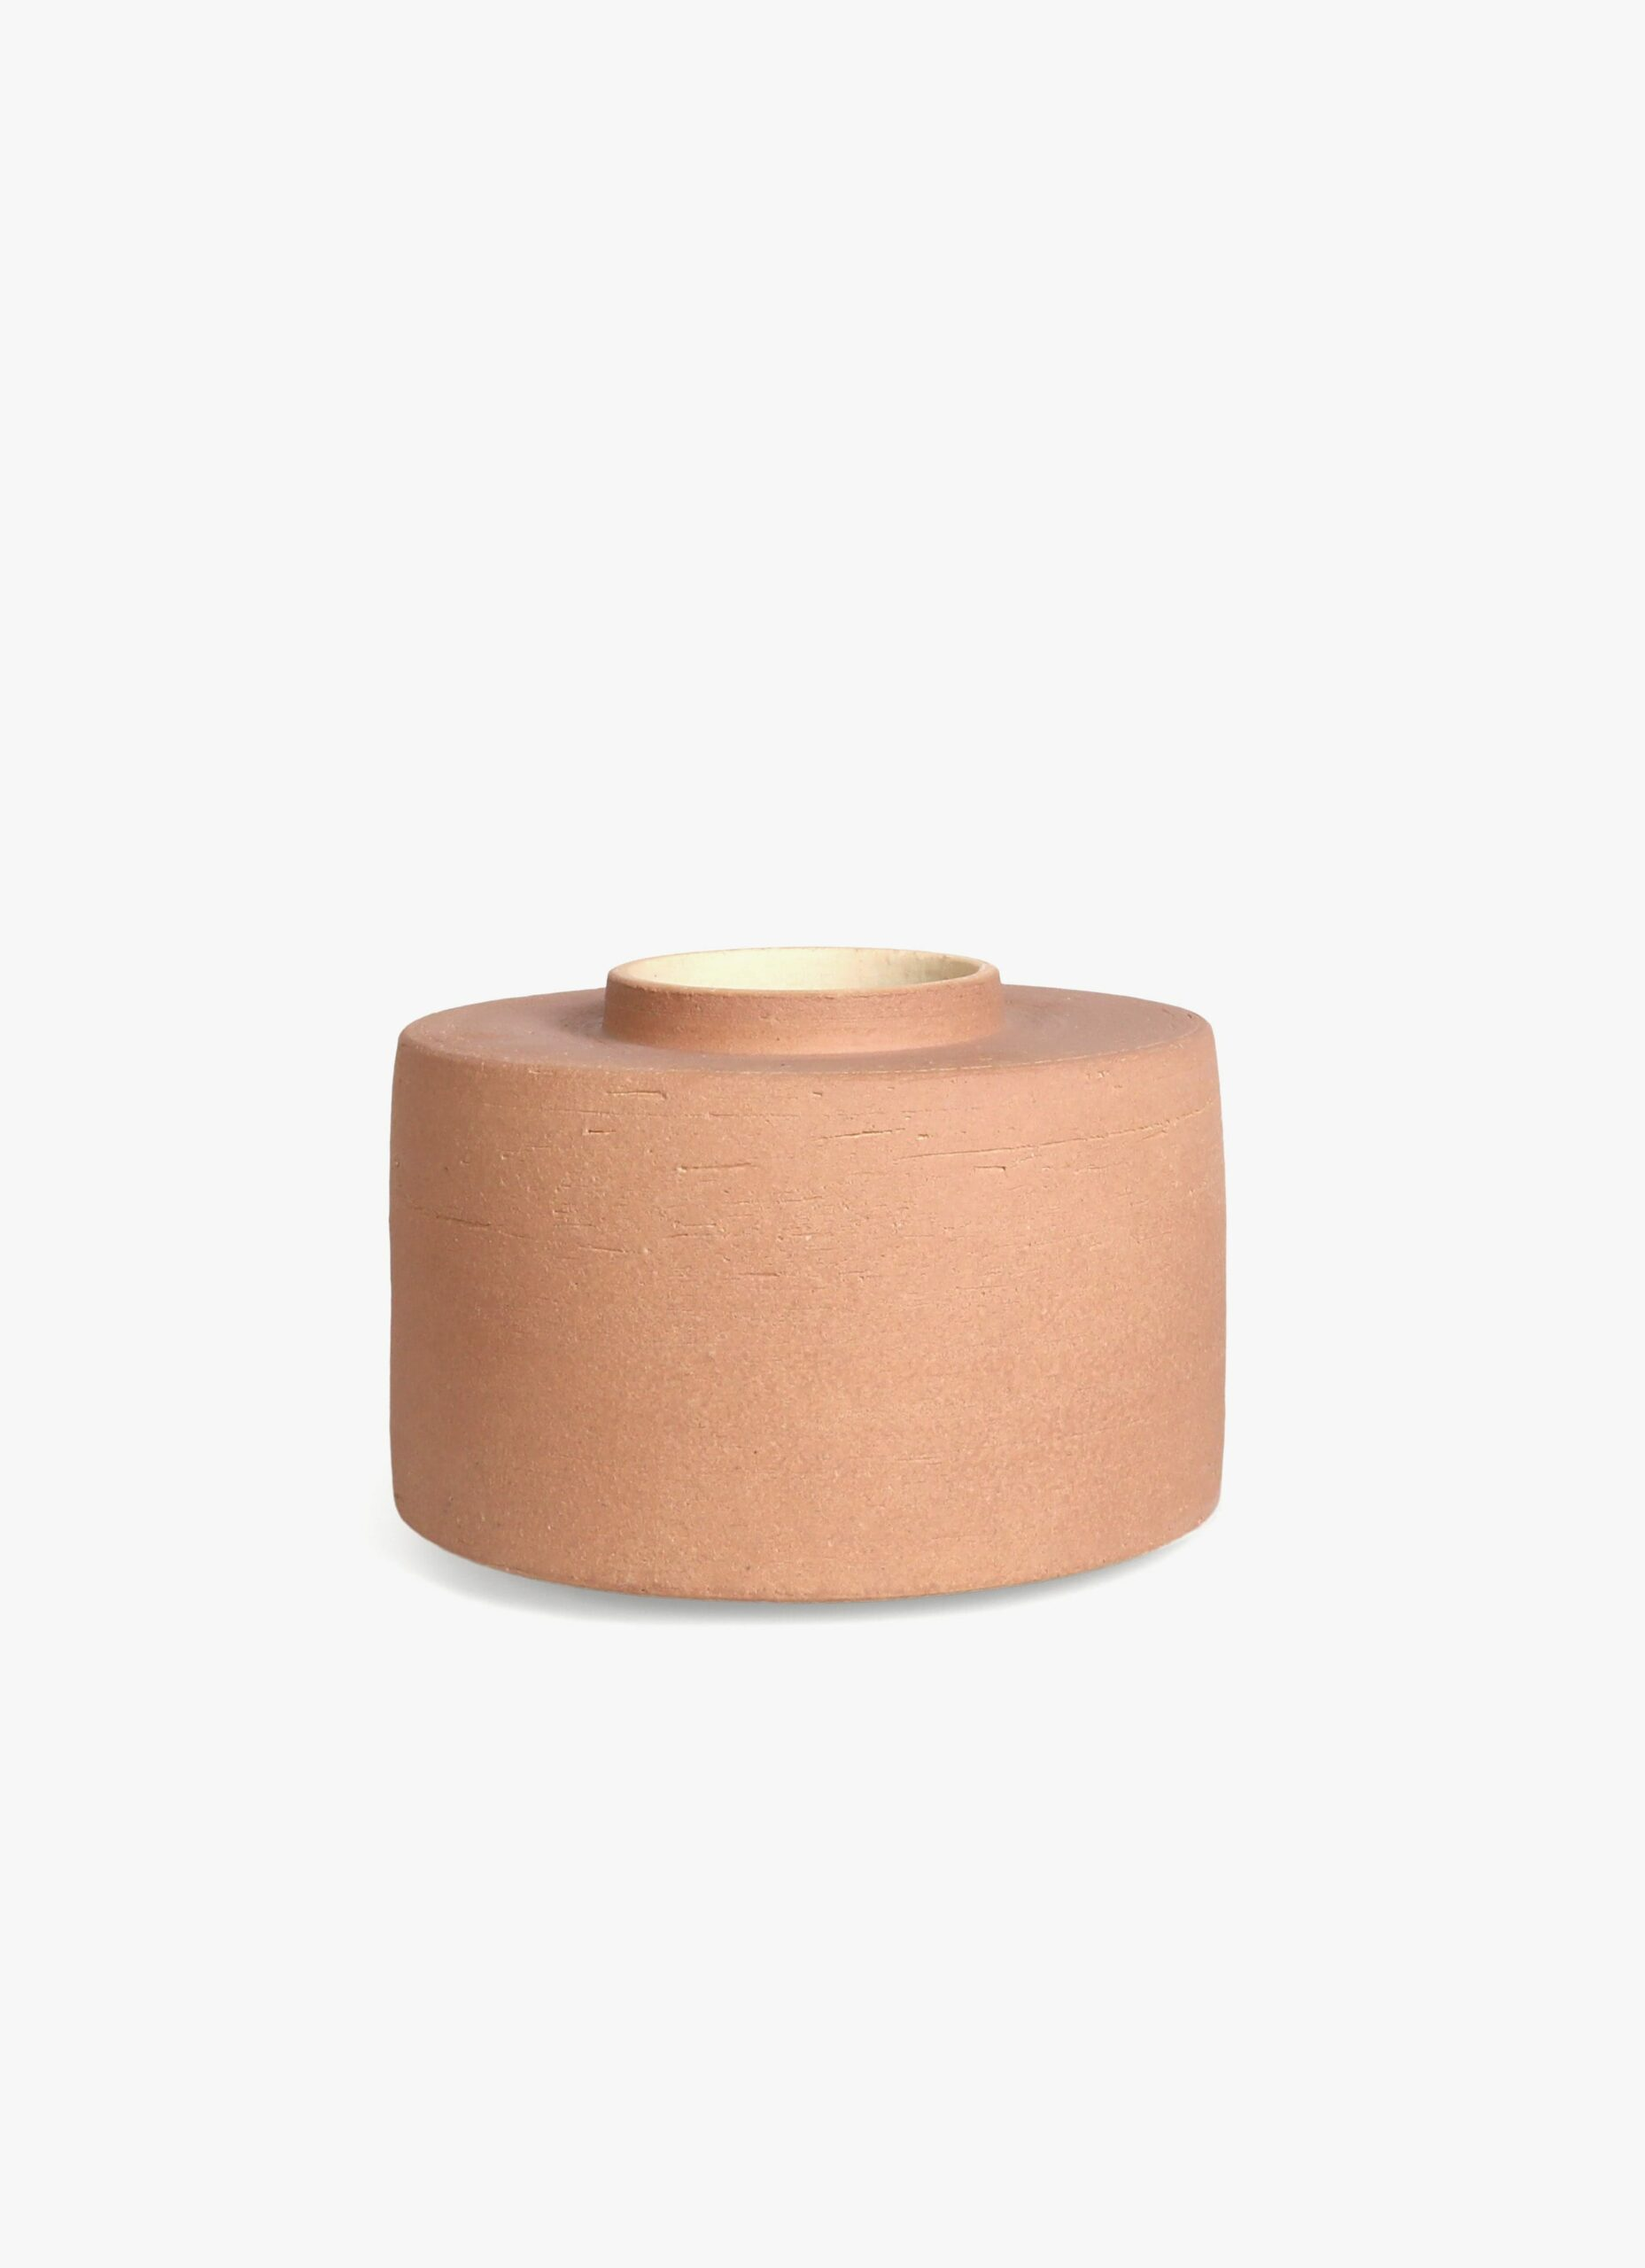 Frama - Otto - Platform Vase - Terra Sand - Large